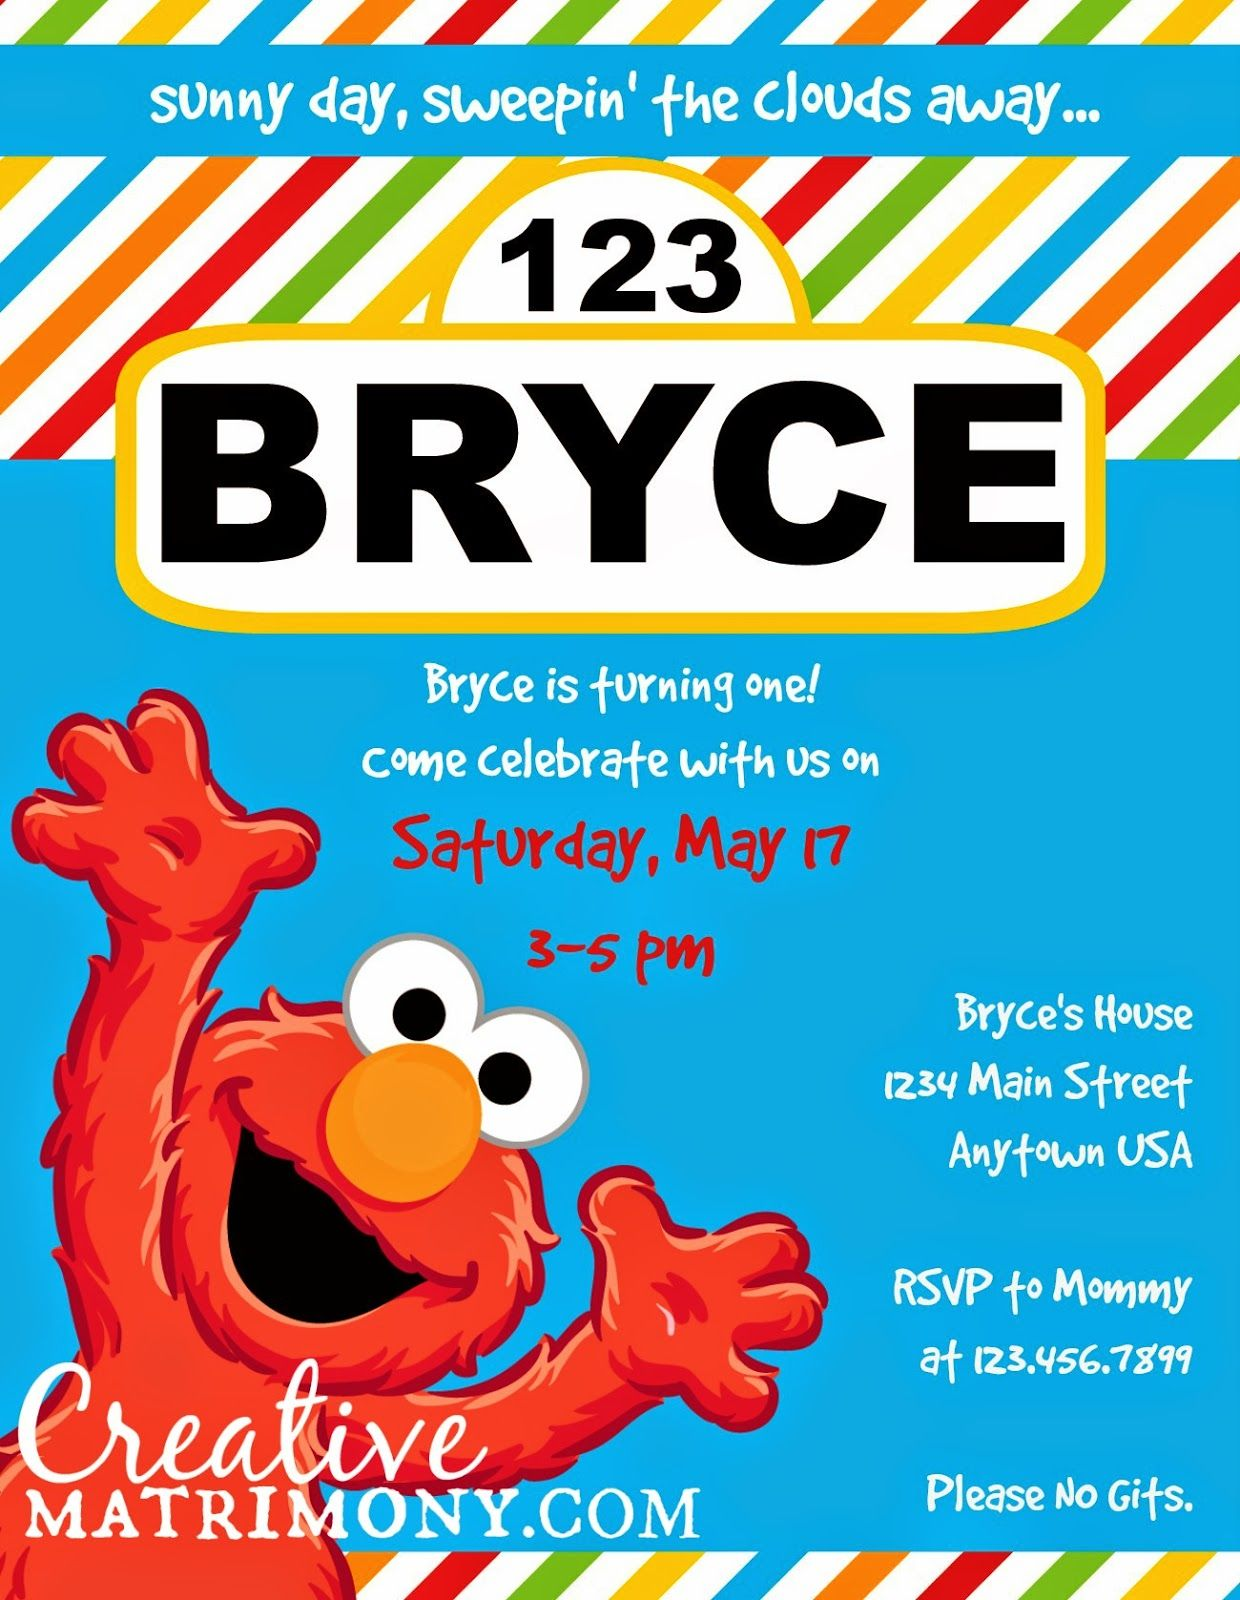 Creative Matrimony Free Sesame Street Inspired Birthday